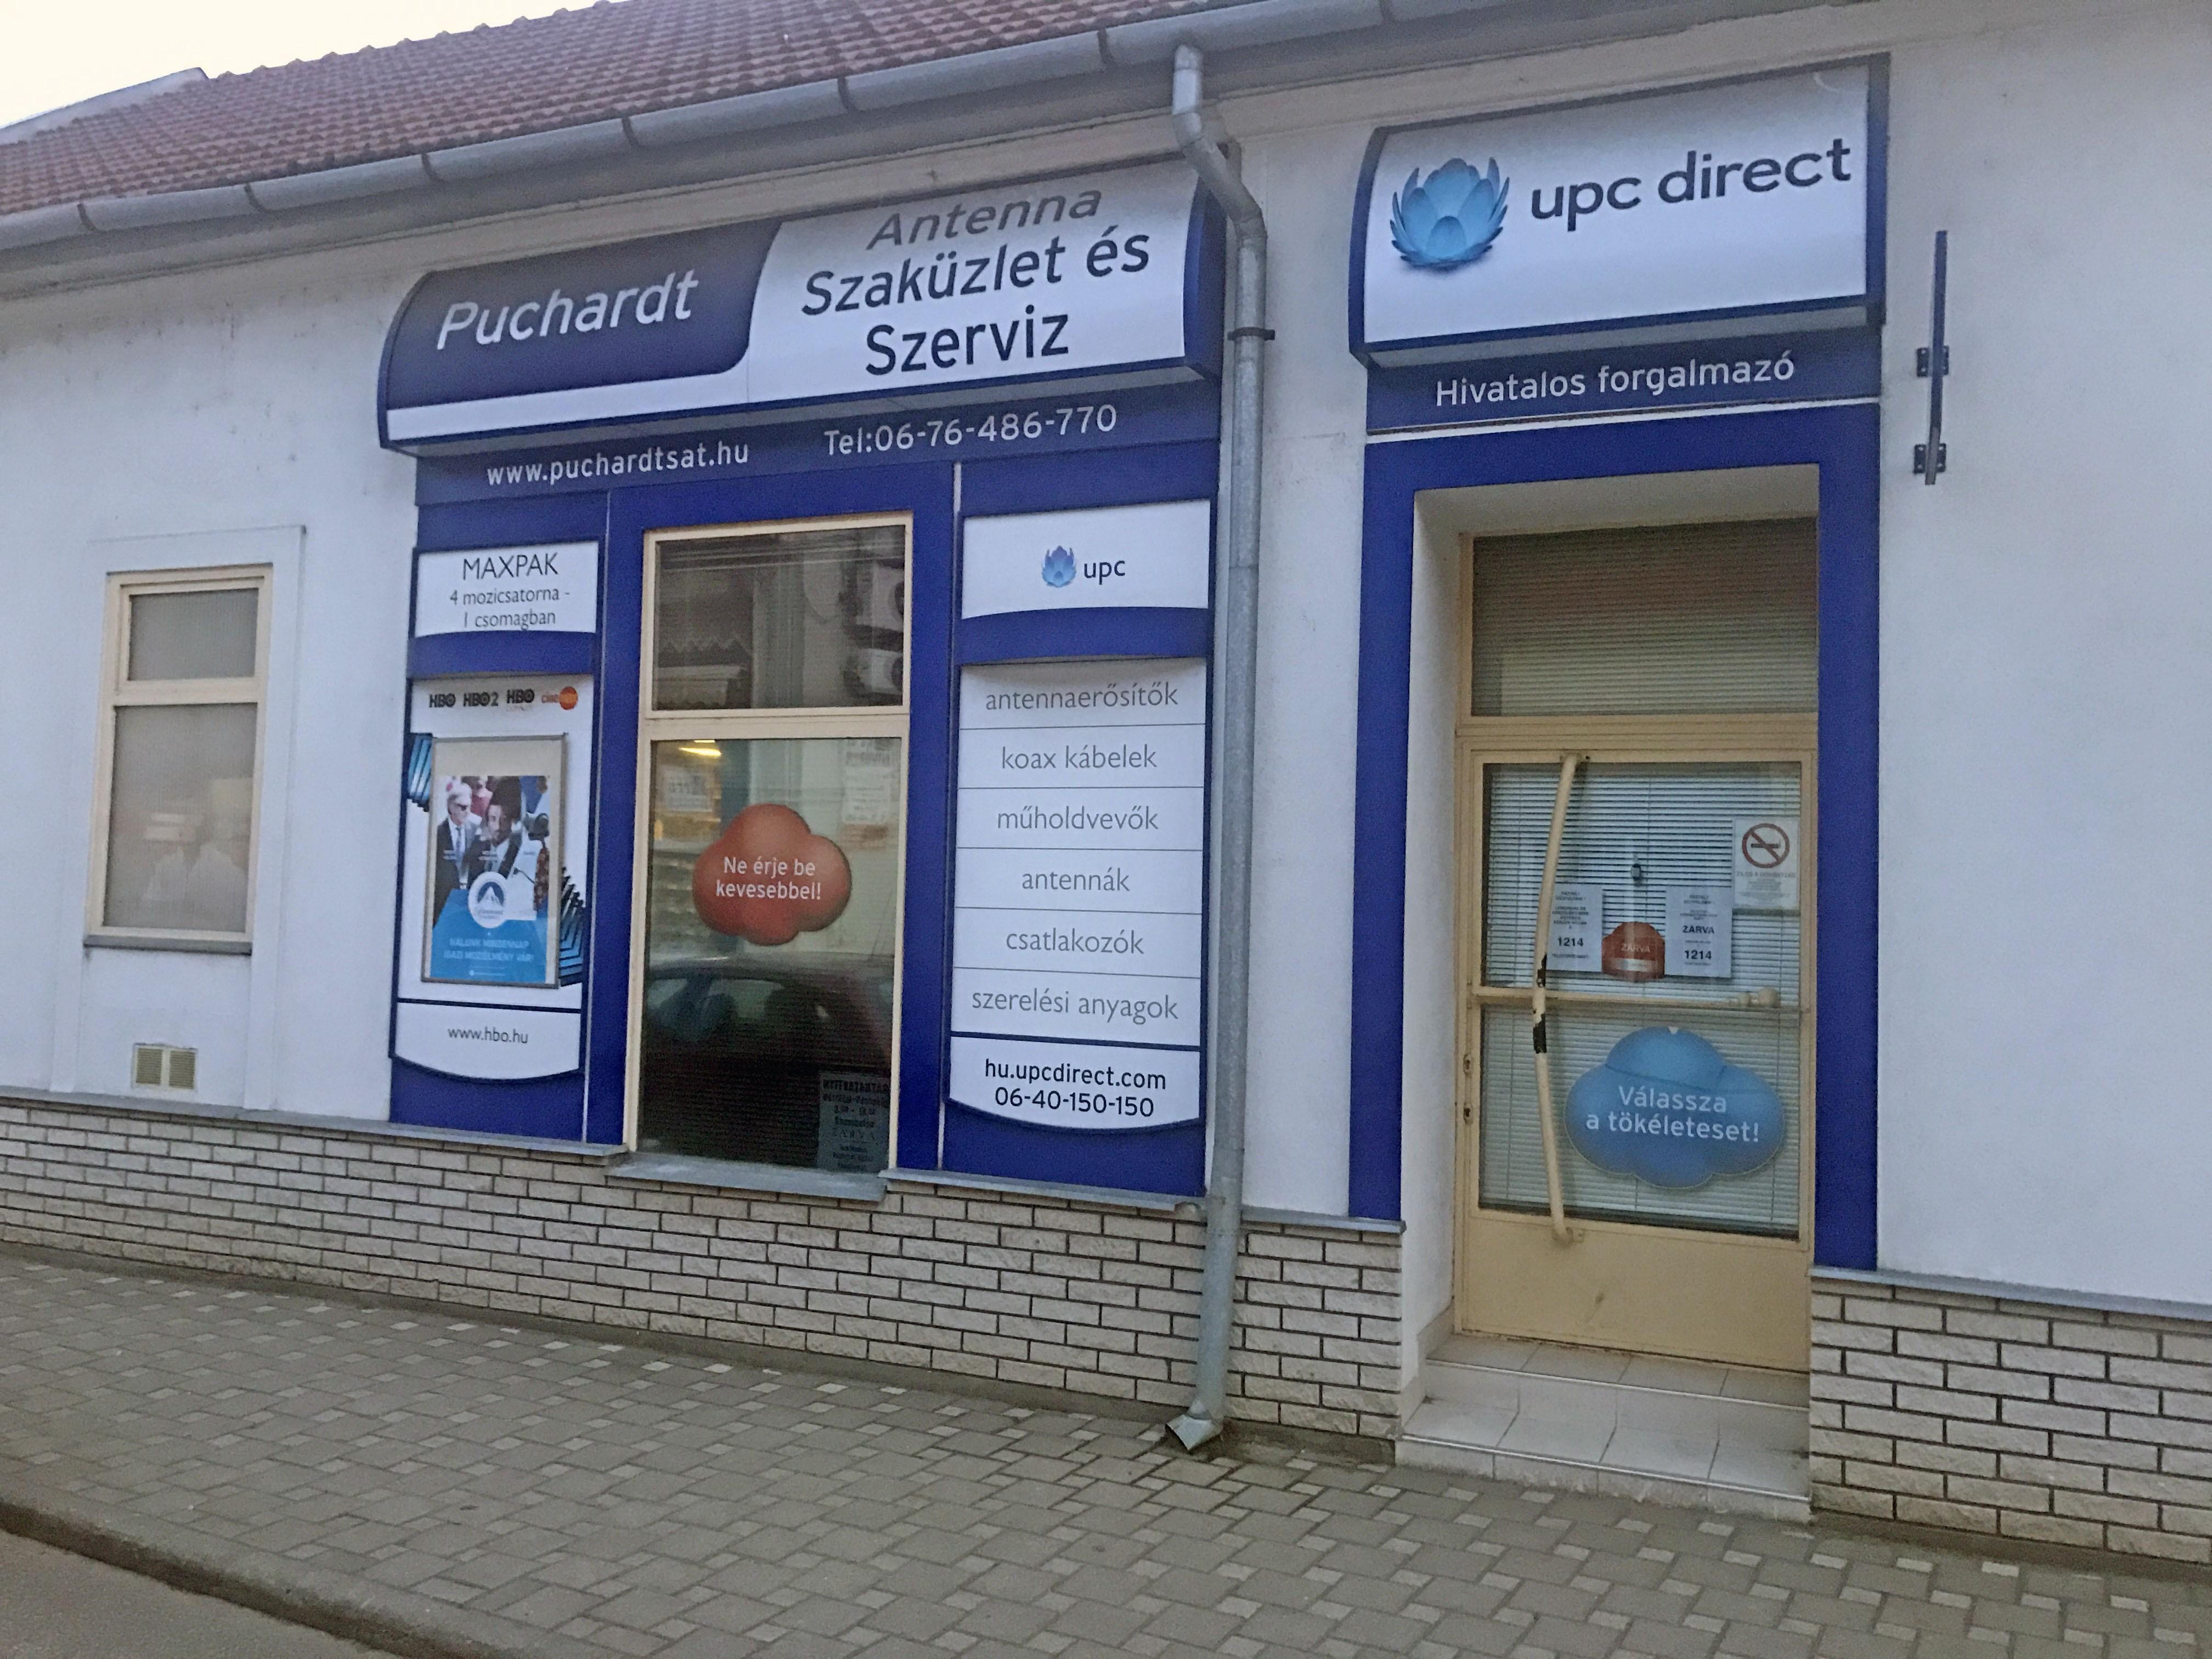 Komoly gondok a magyar UPC Direkt-nél